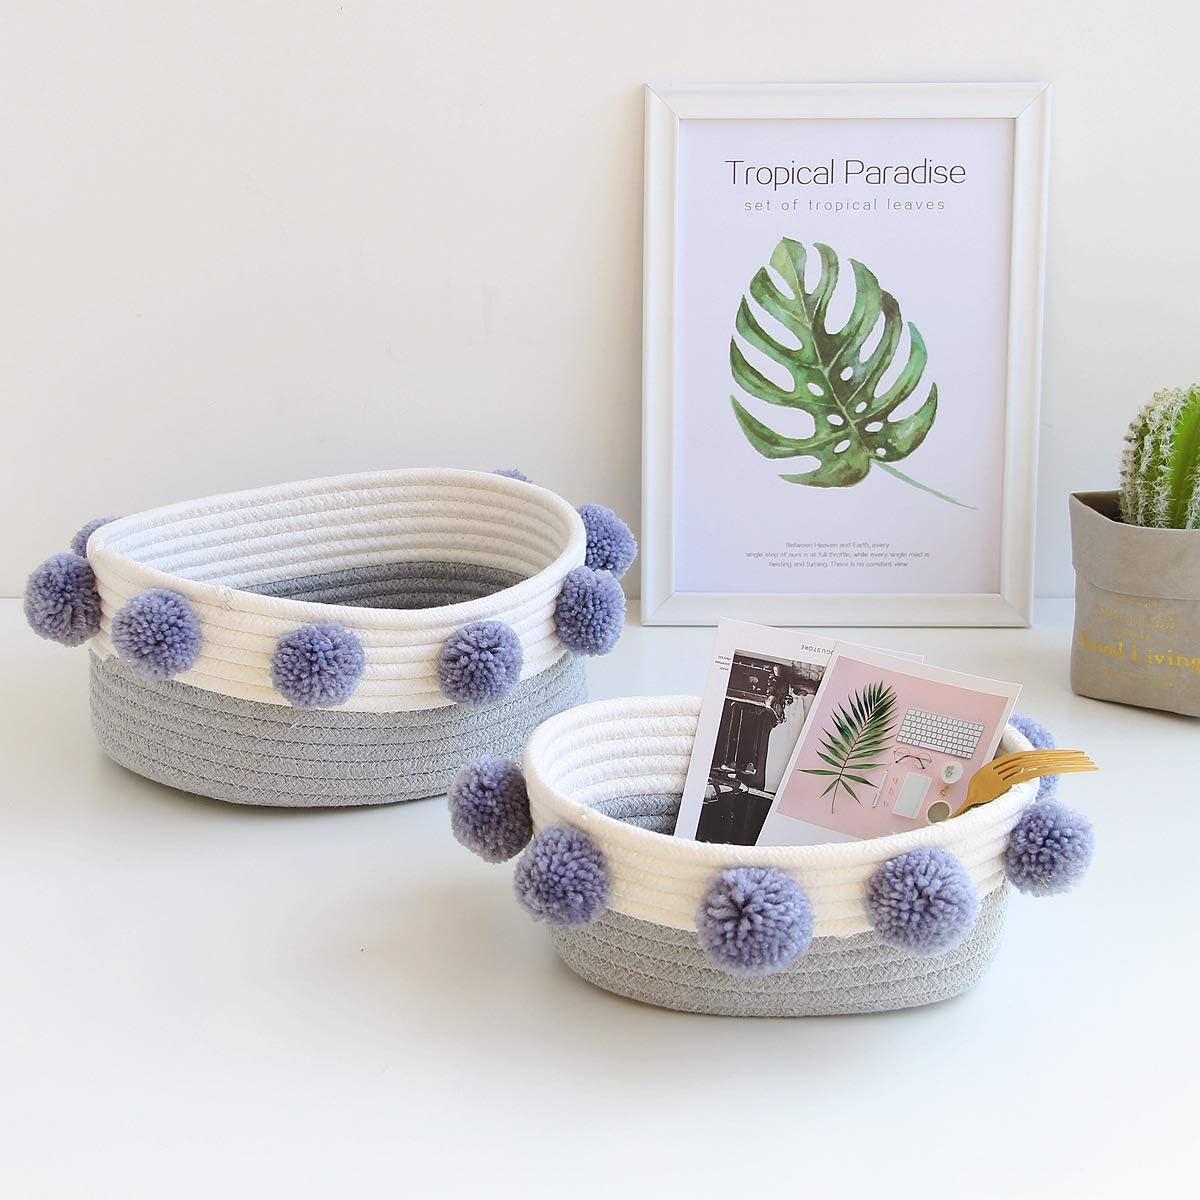 Handmade Wool Ball Cotton Rope Storage Basket, Desktop Decorative Gift Baskets for Christmas, Kids Pet Toy Book Cosmetic Basket 2 pack (Blue)